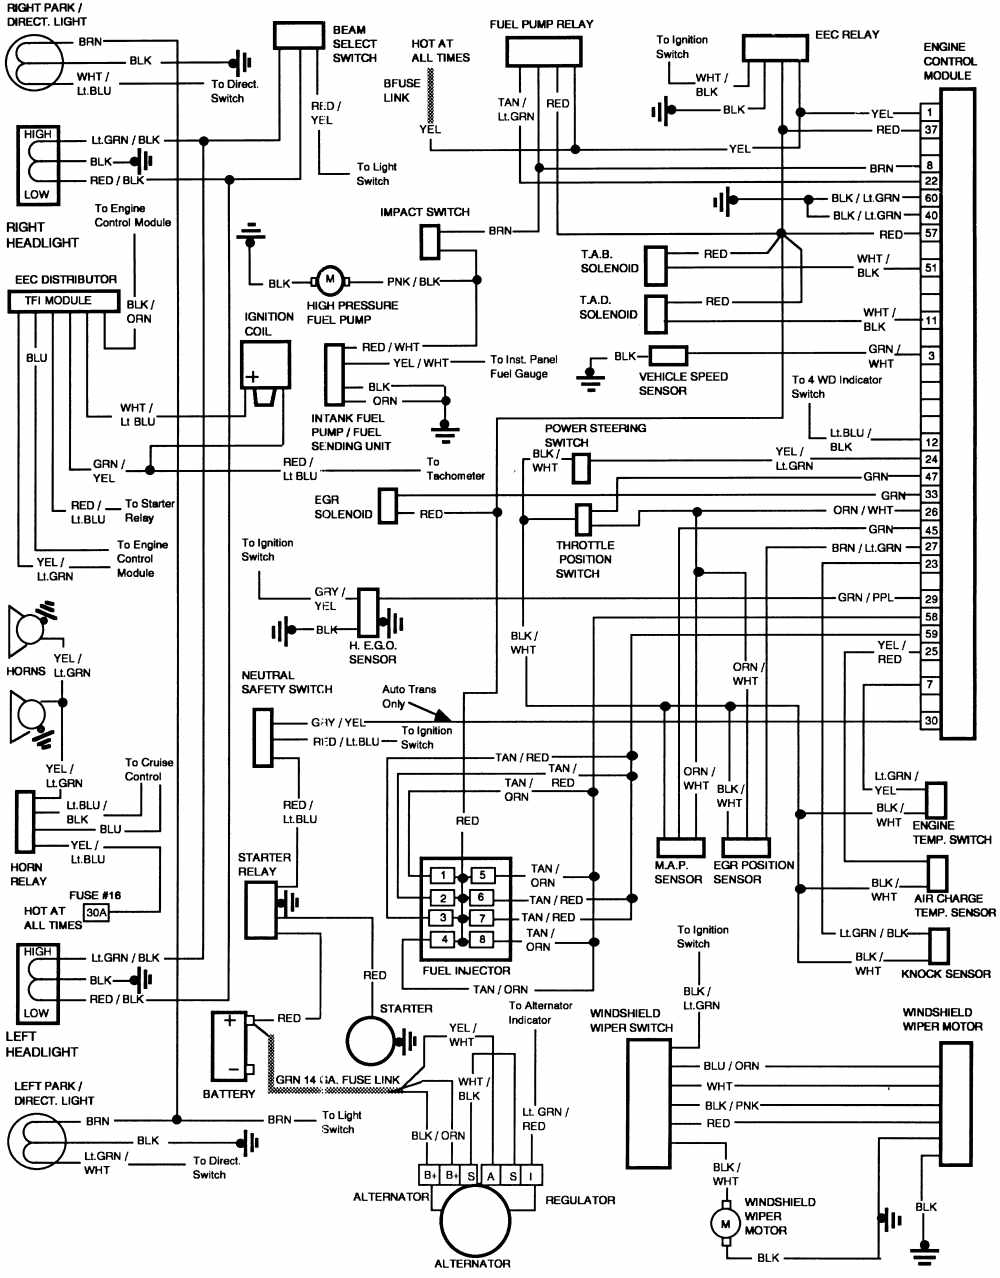 Opel Astra Mk3 Wiring Diagram - 1999 Buick Park Avenue Fuse Diagram -  schematics-source.tukune.jeanjaures37.frWiring Diagram Resource